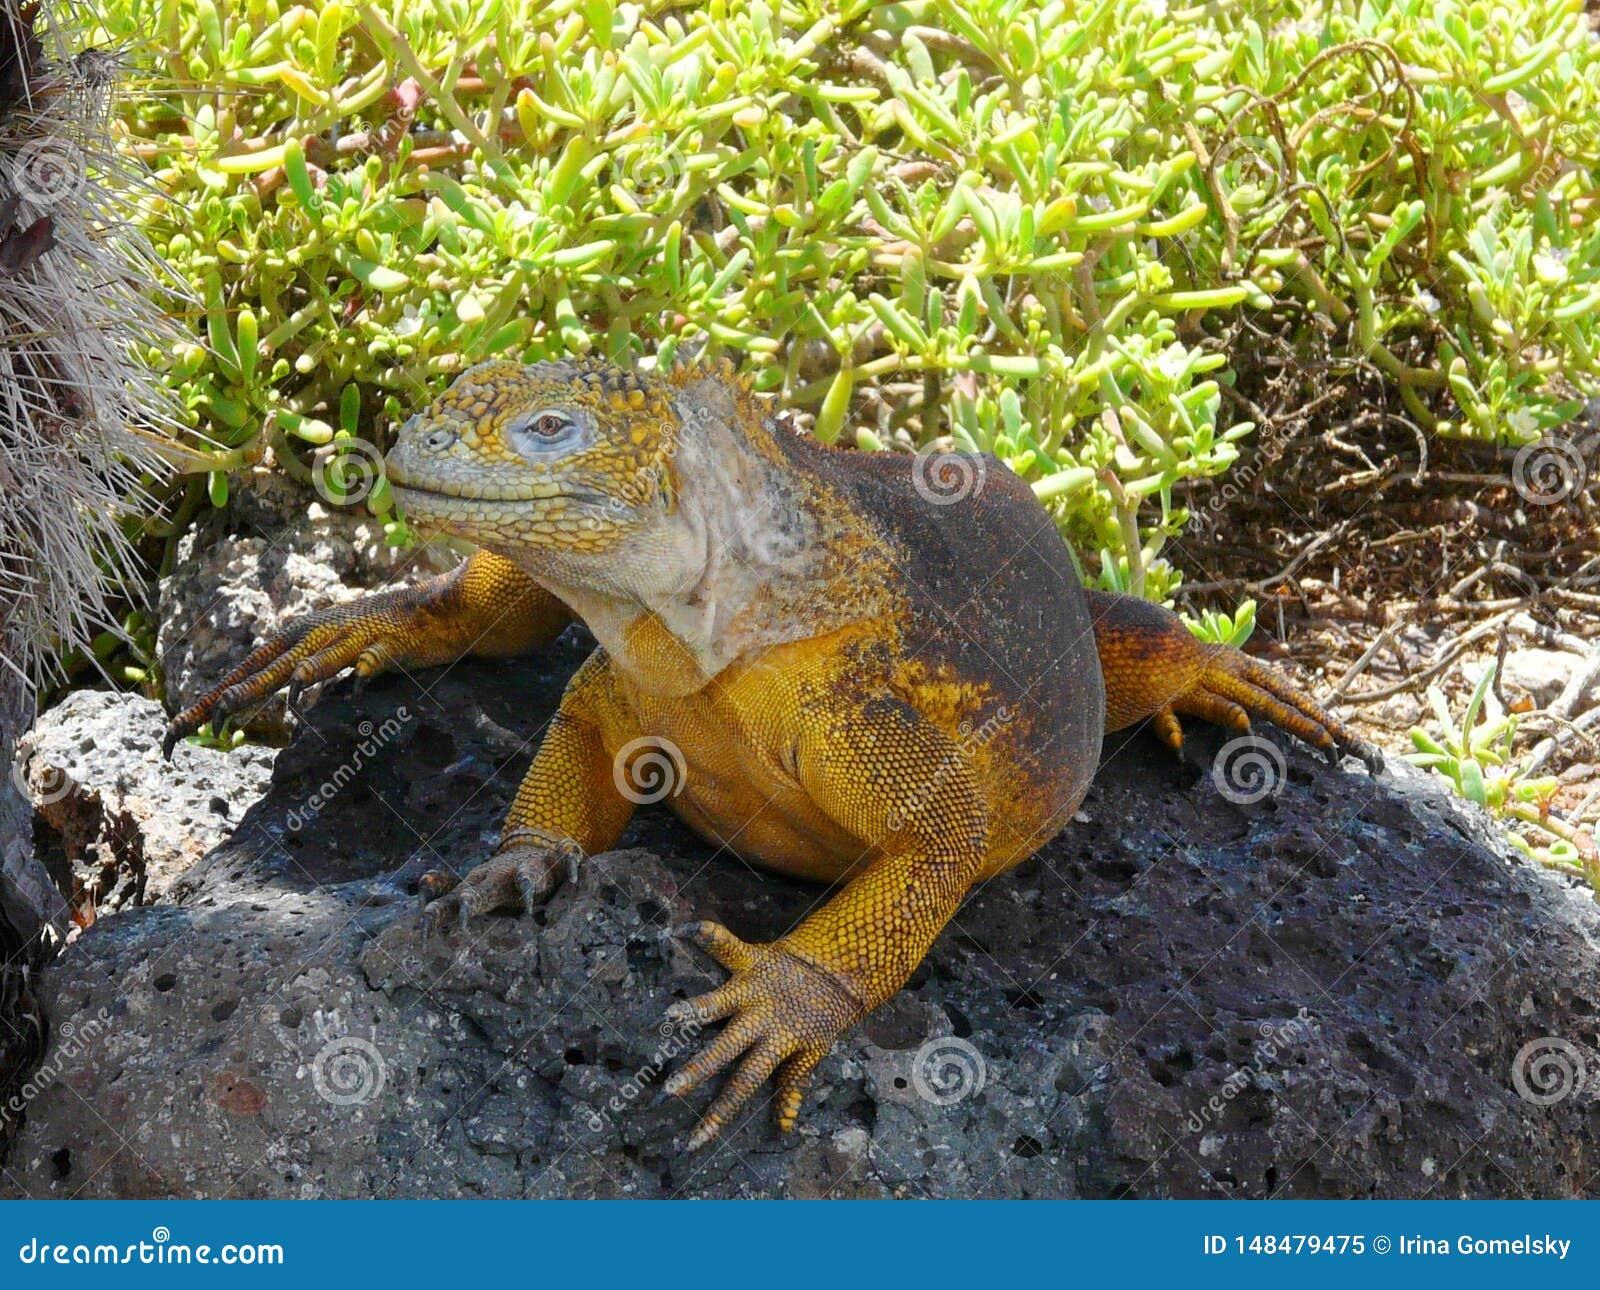 Yellow Iguana sitting on a stone, Galapagos Islands, Ecuador